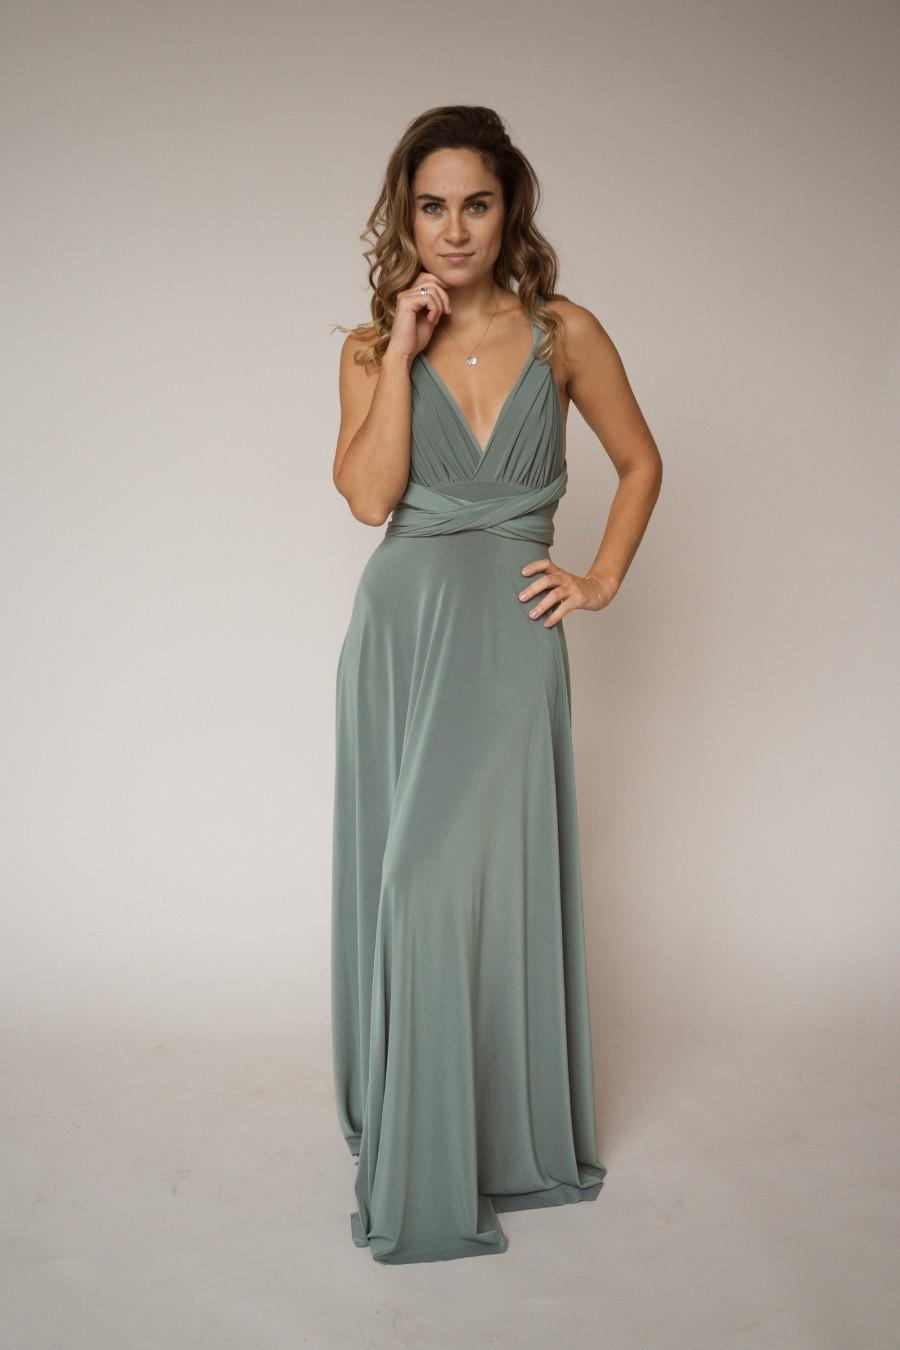 Wedding - Sage green bridesmaid dress, moss green infinity dress, sage green convertible dress, moss green multiway dress, sage green bridesmaid dress